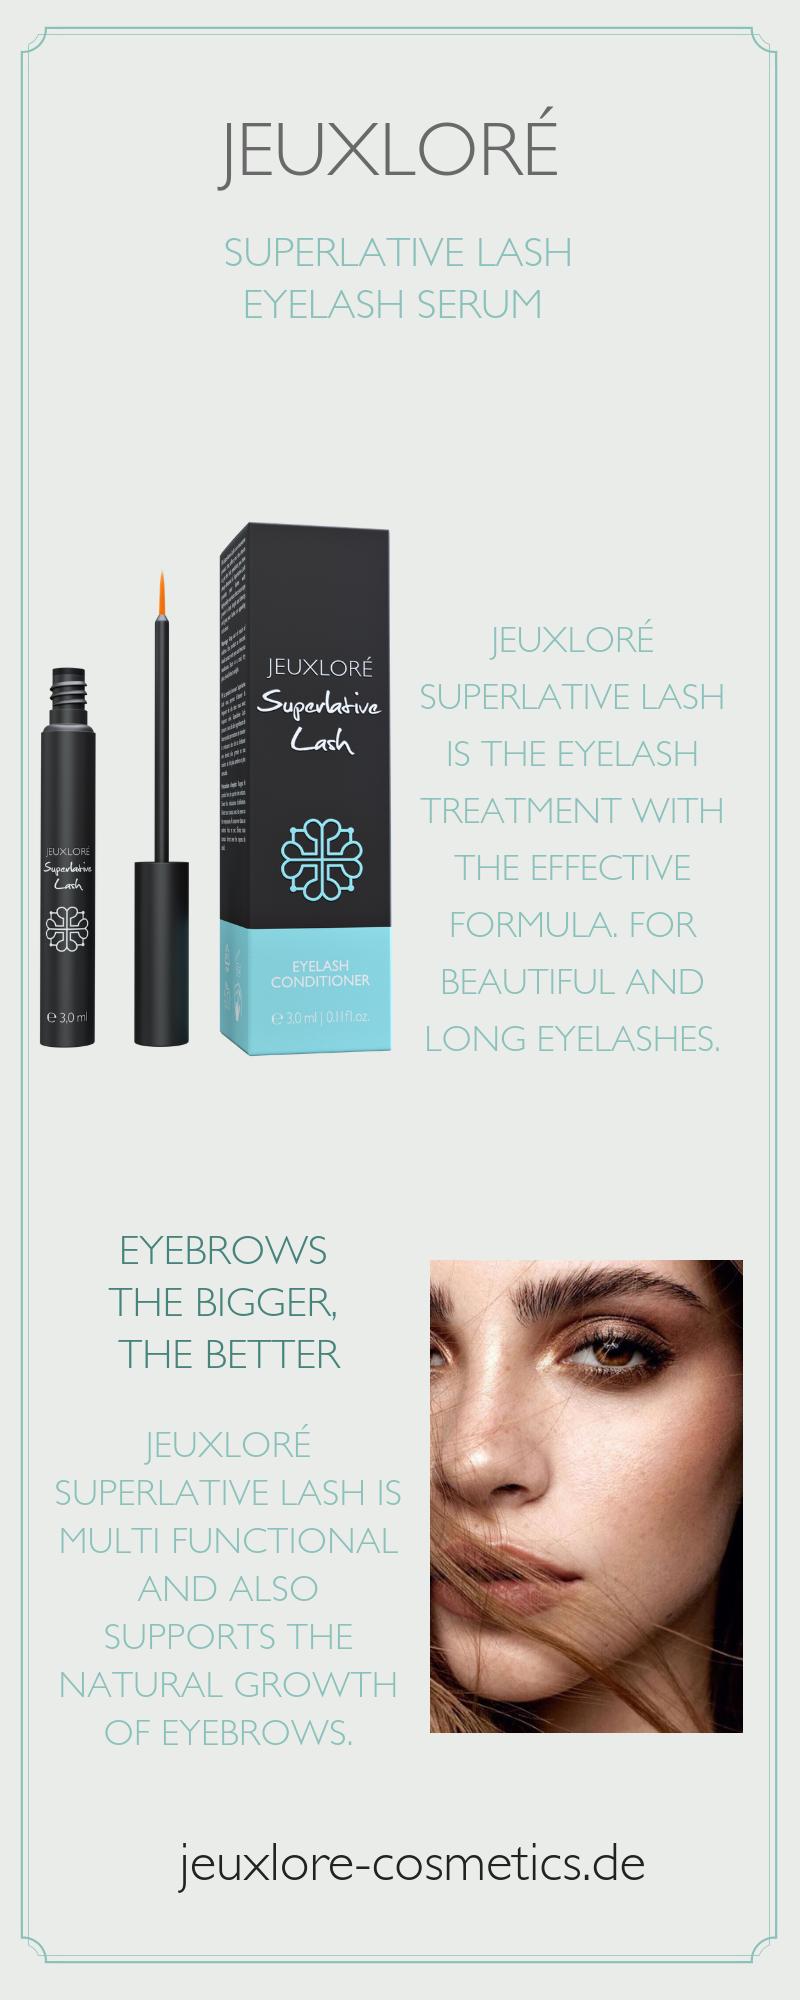 86733e210f8 THE EYELASH SERUM Jeuxloré Superlative Lash is the eyelash treatment with the  effective formula. For